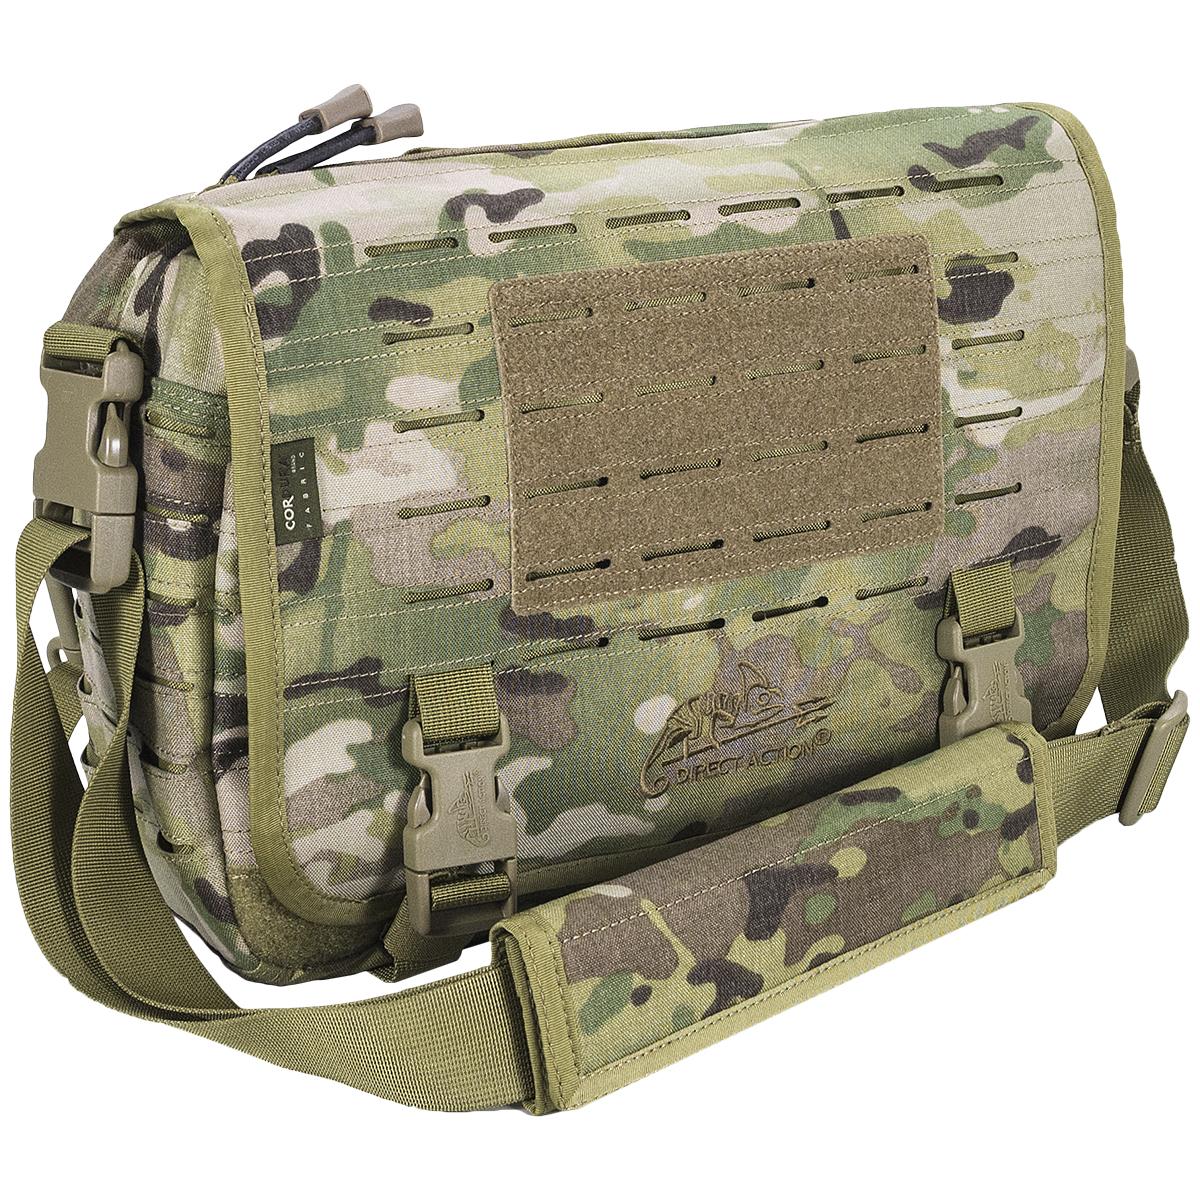 fb51cce6aca Details about direct action small messenger bag military photo shoulder  pack multicam camo jpg 1200x1200 Multicam